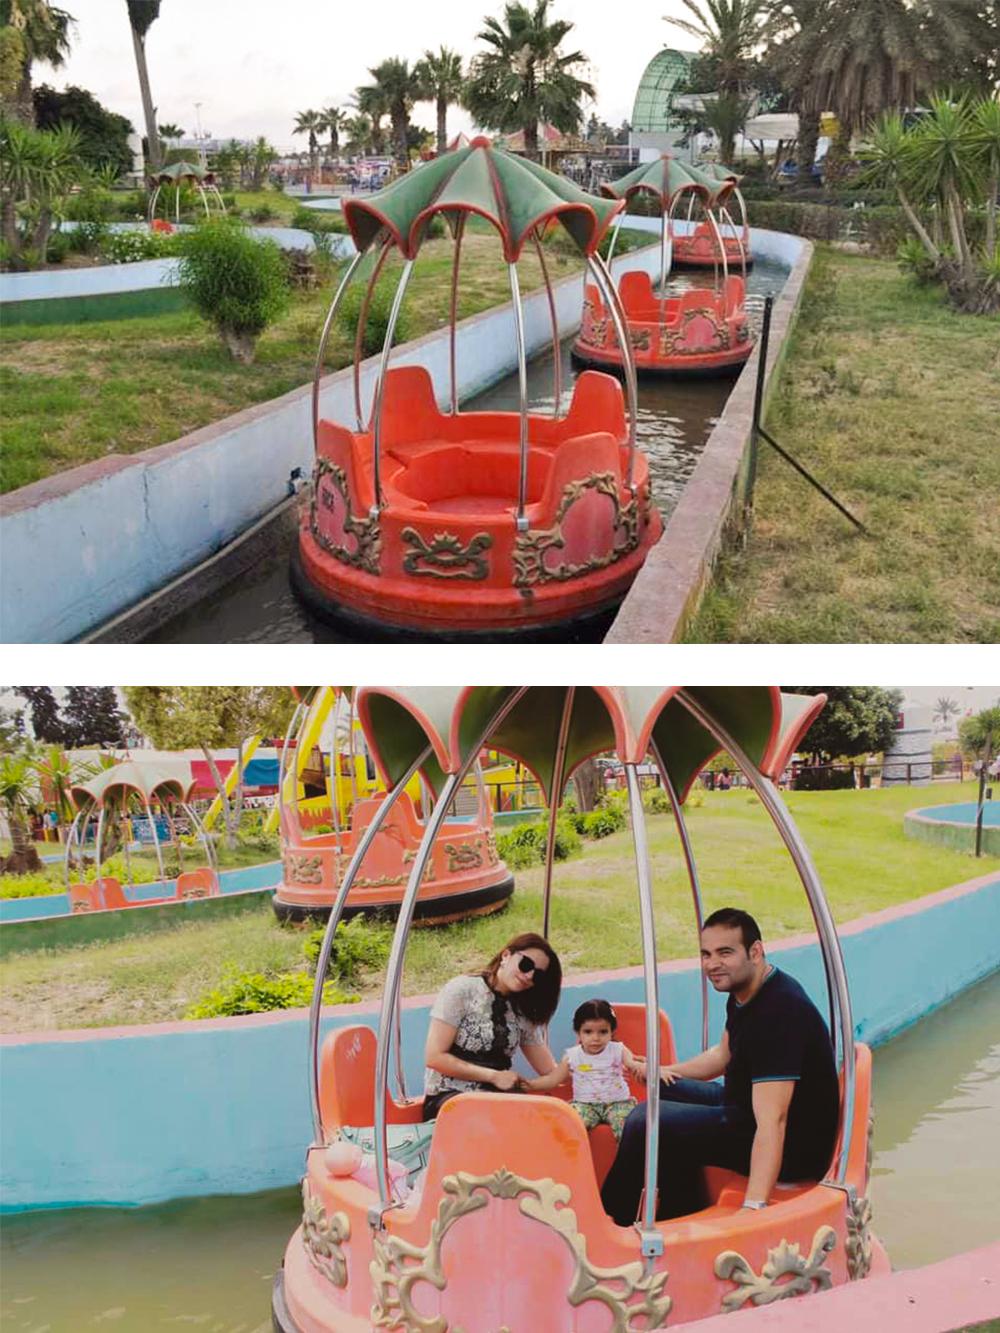 Interlink New Ride : Spin Boat La Riviere Enchantée at Hannibal Park Soukra 7